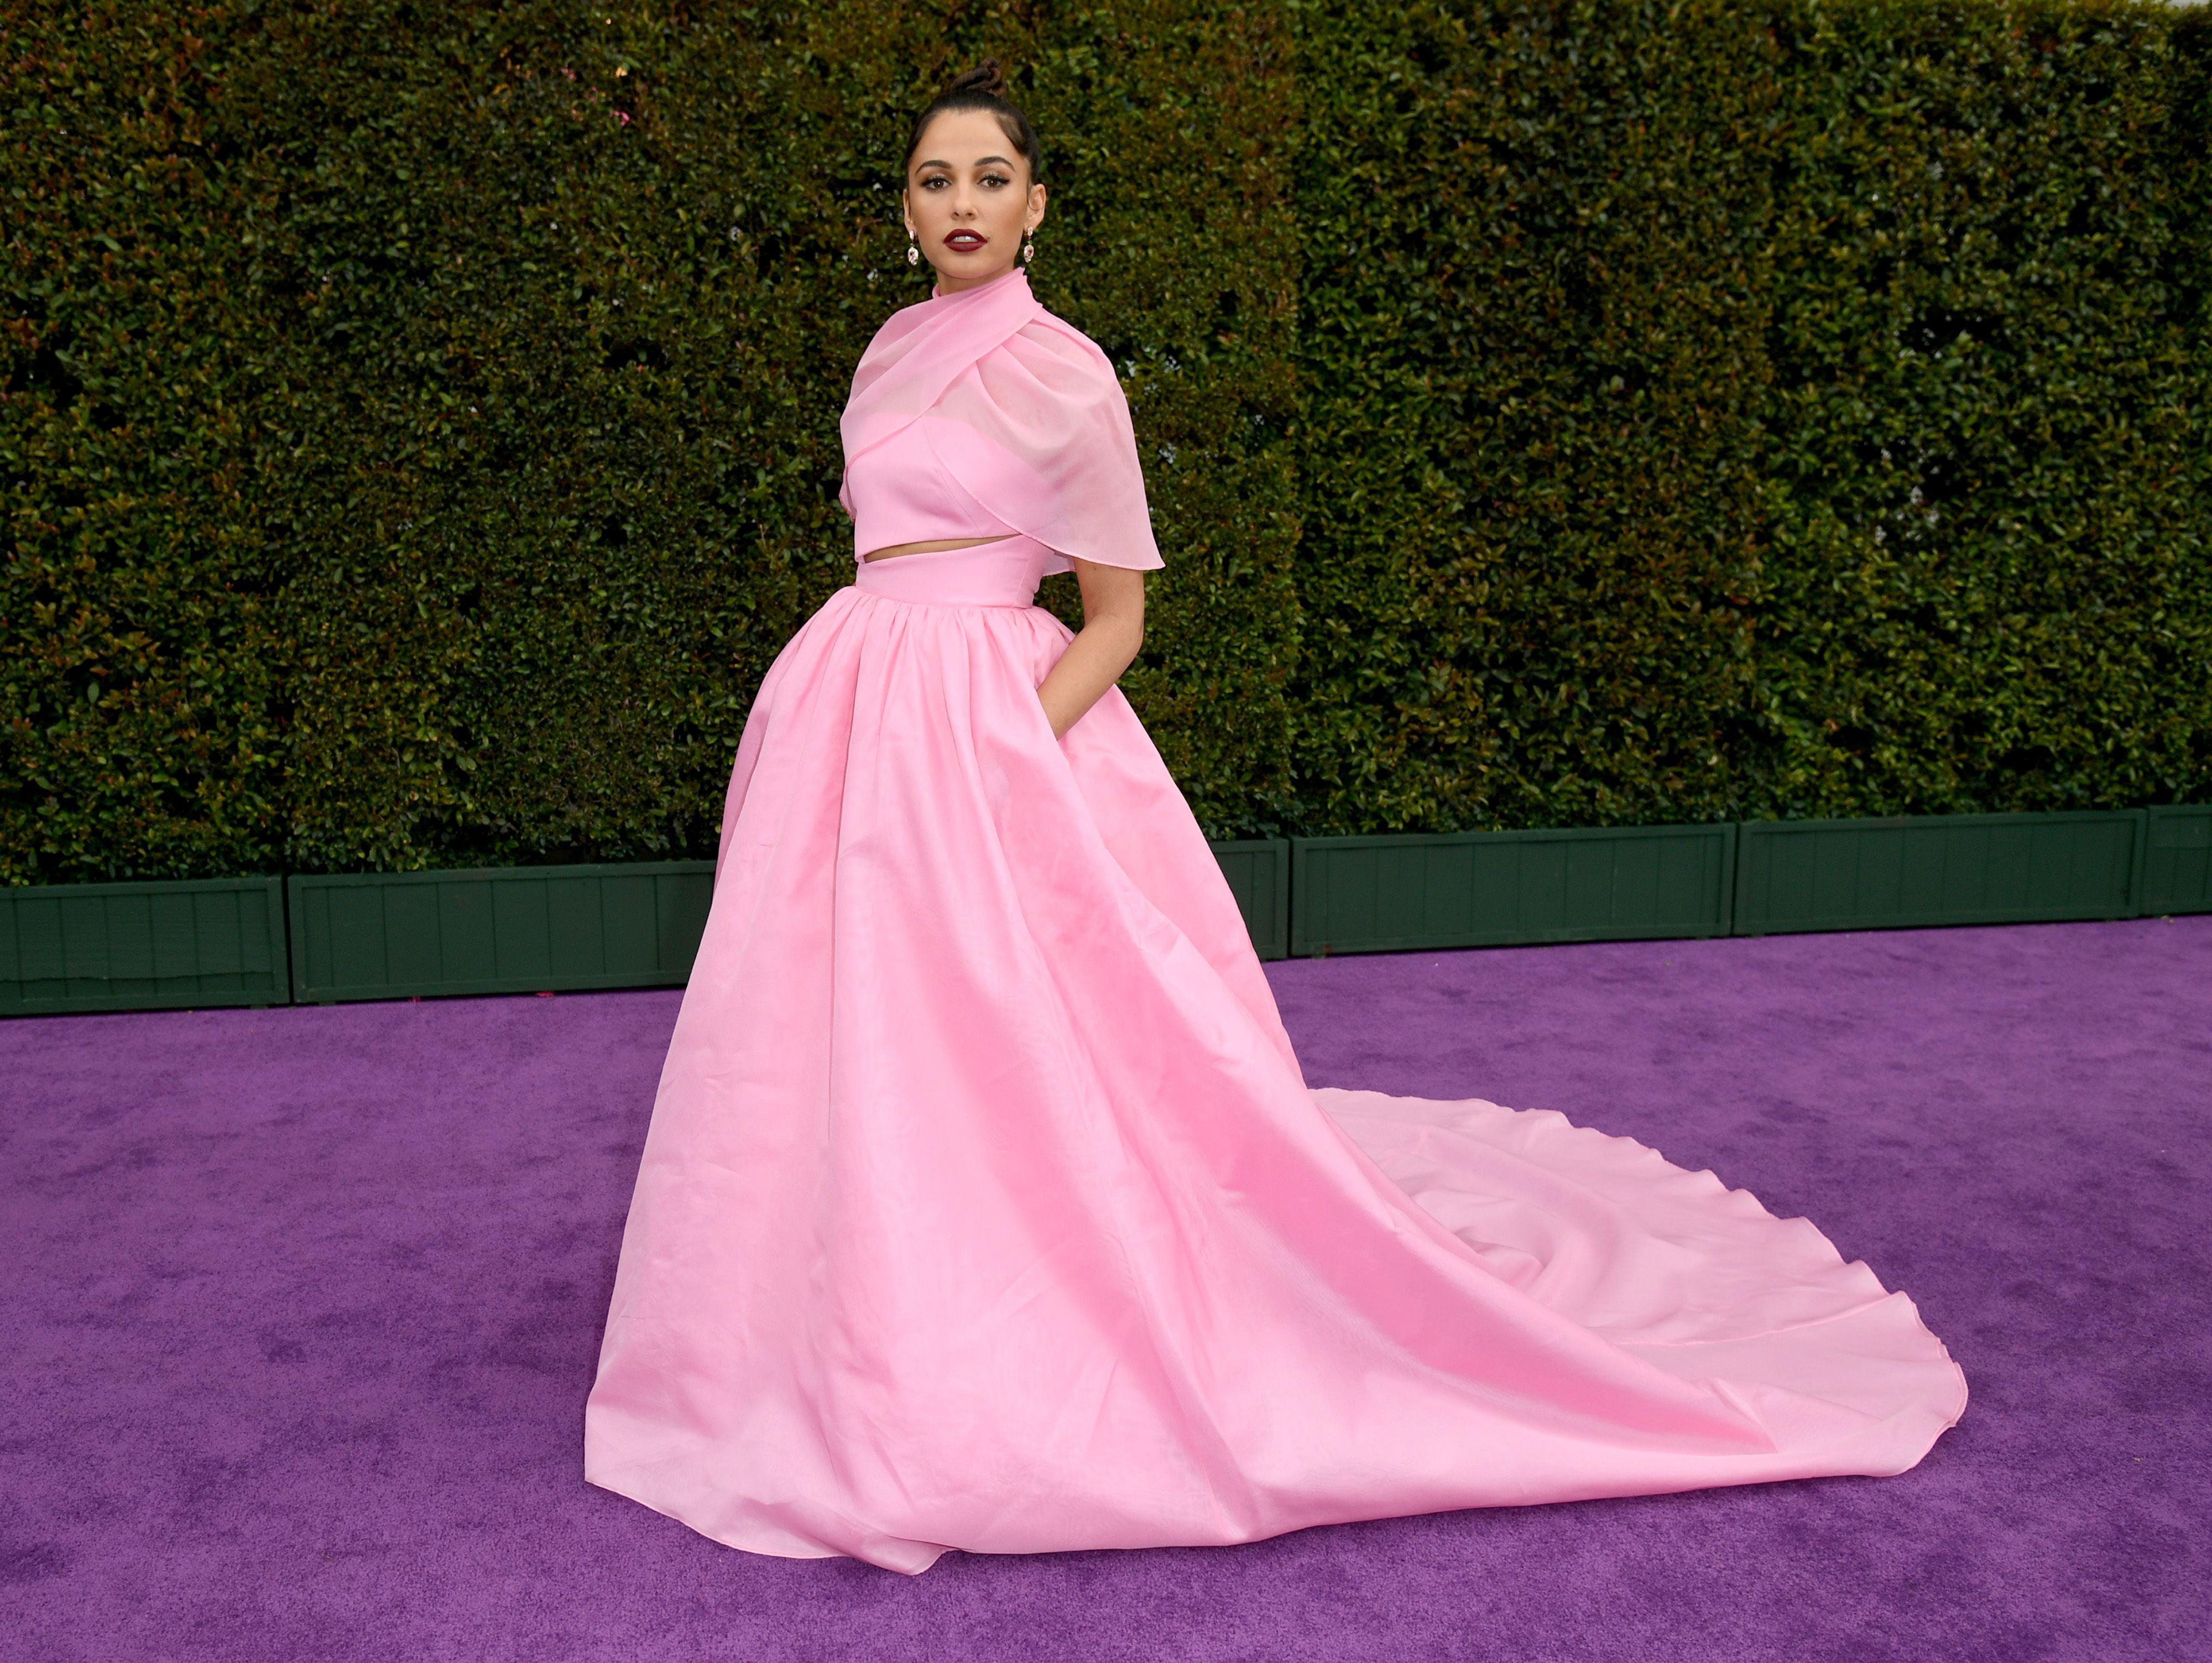 Naomi Scott Has Nailed the Modern Princess Aesthetic on Her 'Aladdin' Press Tour